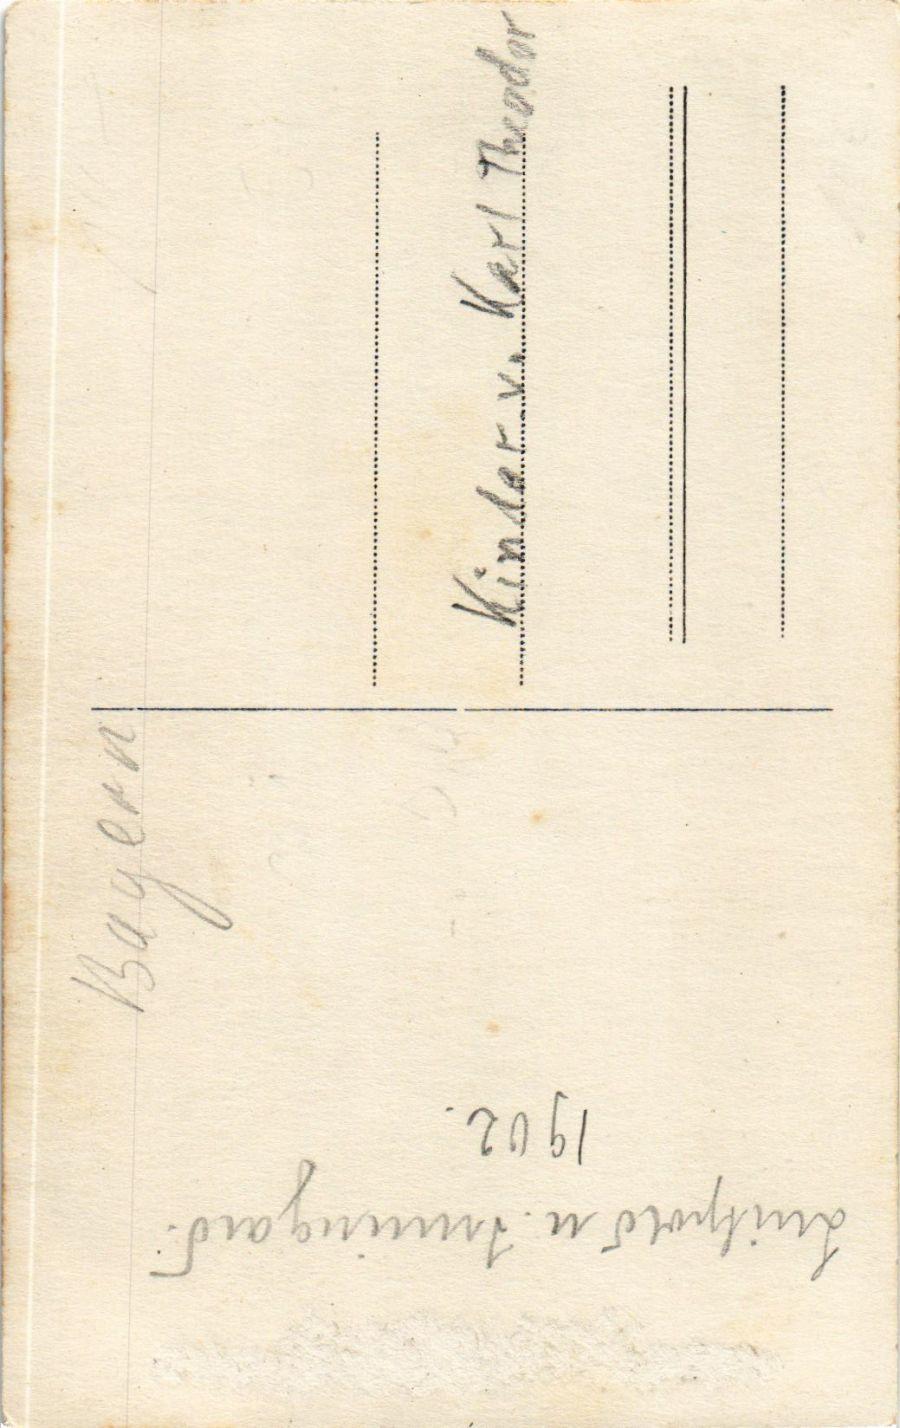 CPA-AK-Prinz-Luitpold-Prinzessin-Irmingard-v-Bayern-GERMAN-ROYALTY-867399 Indexbild 2